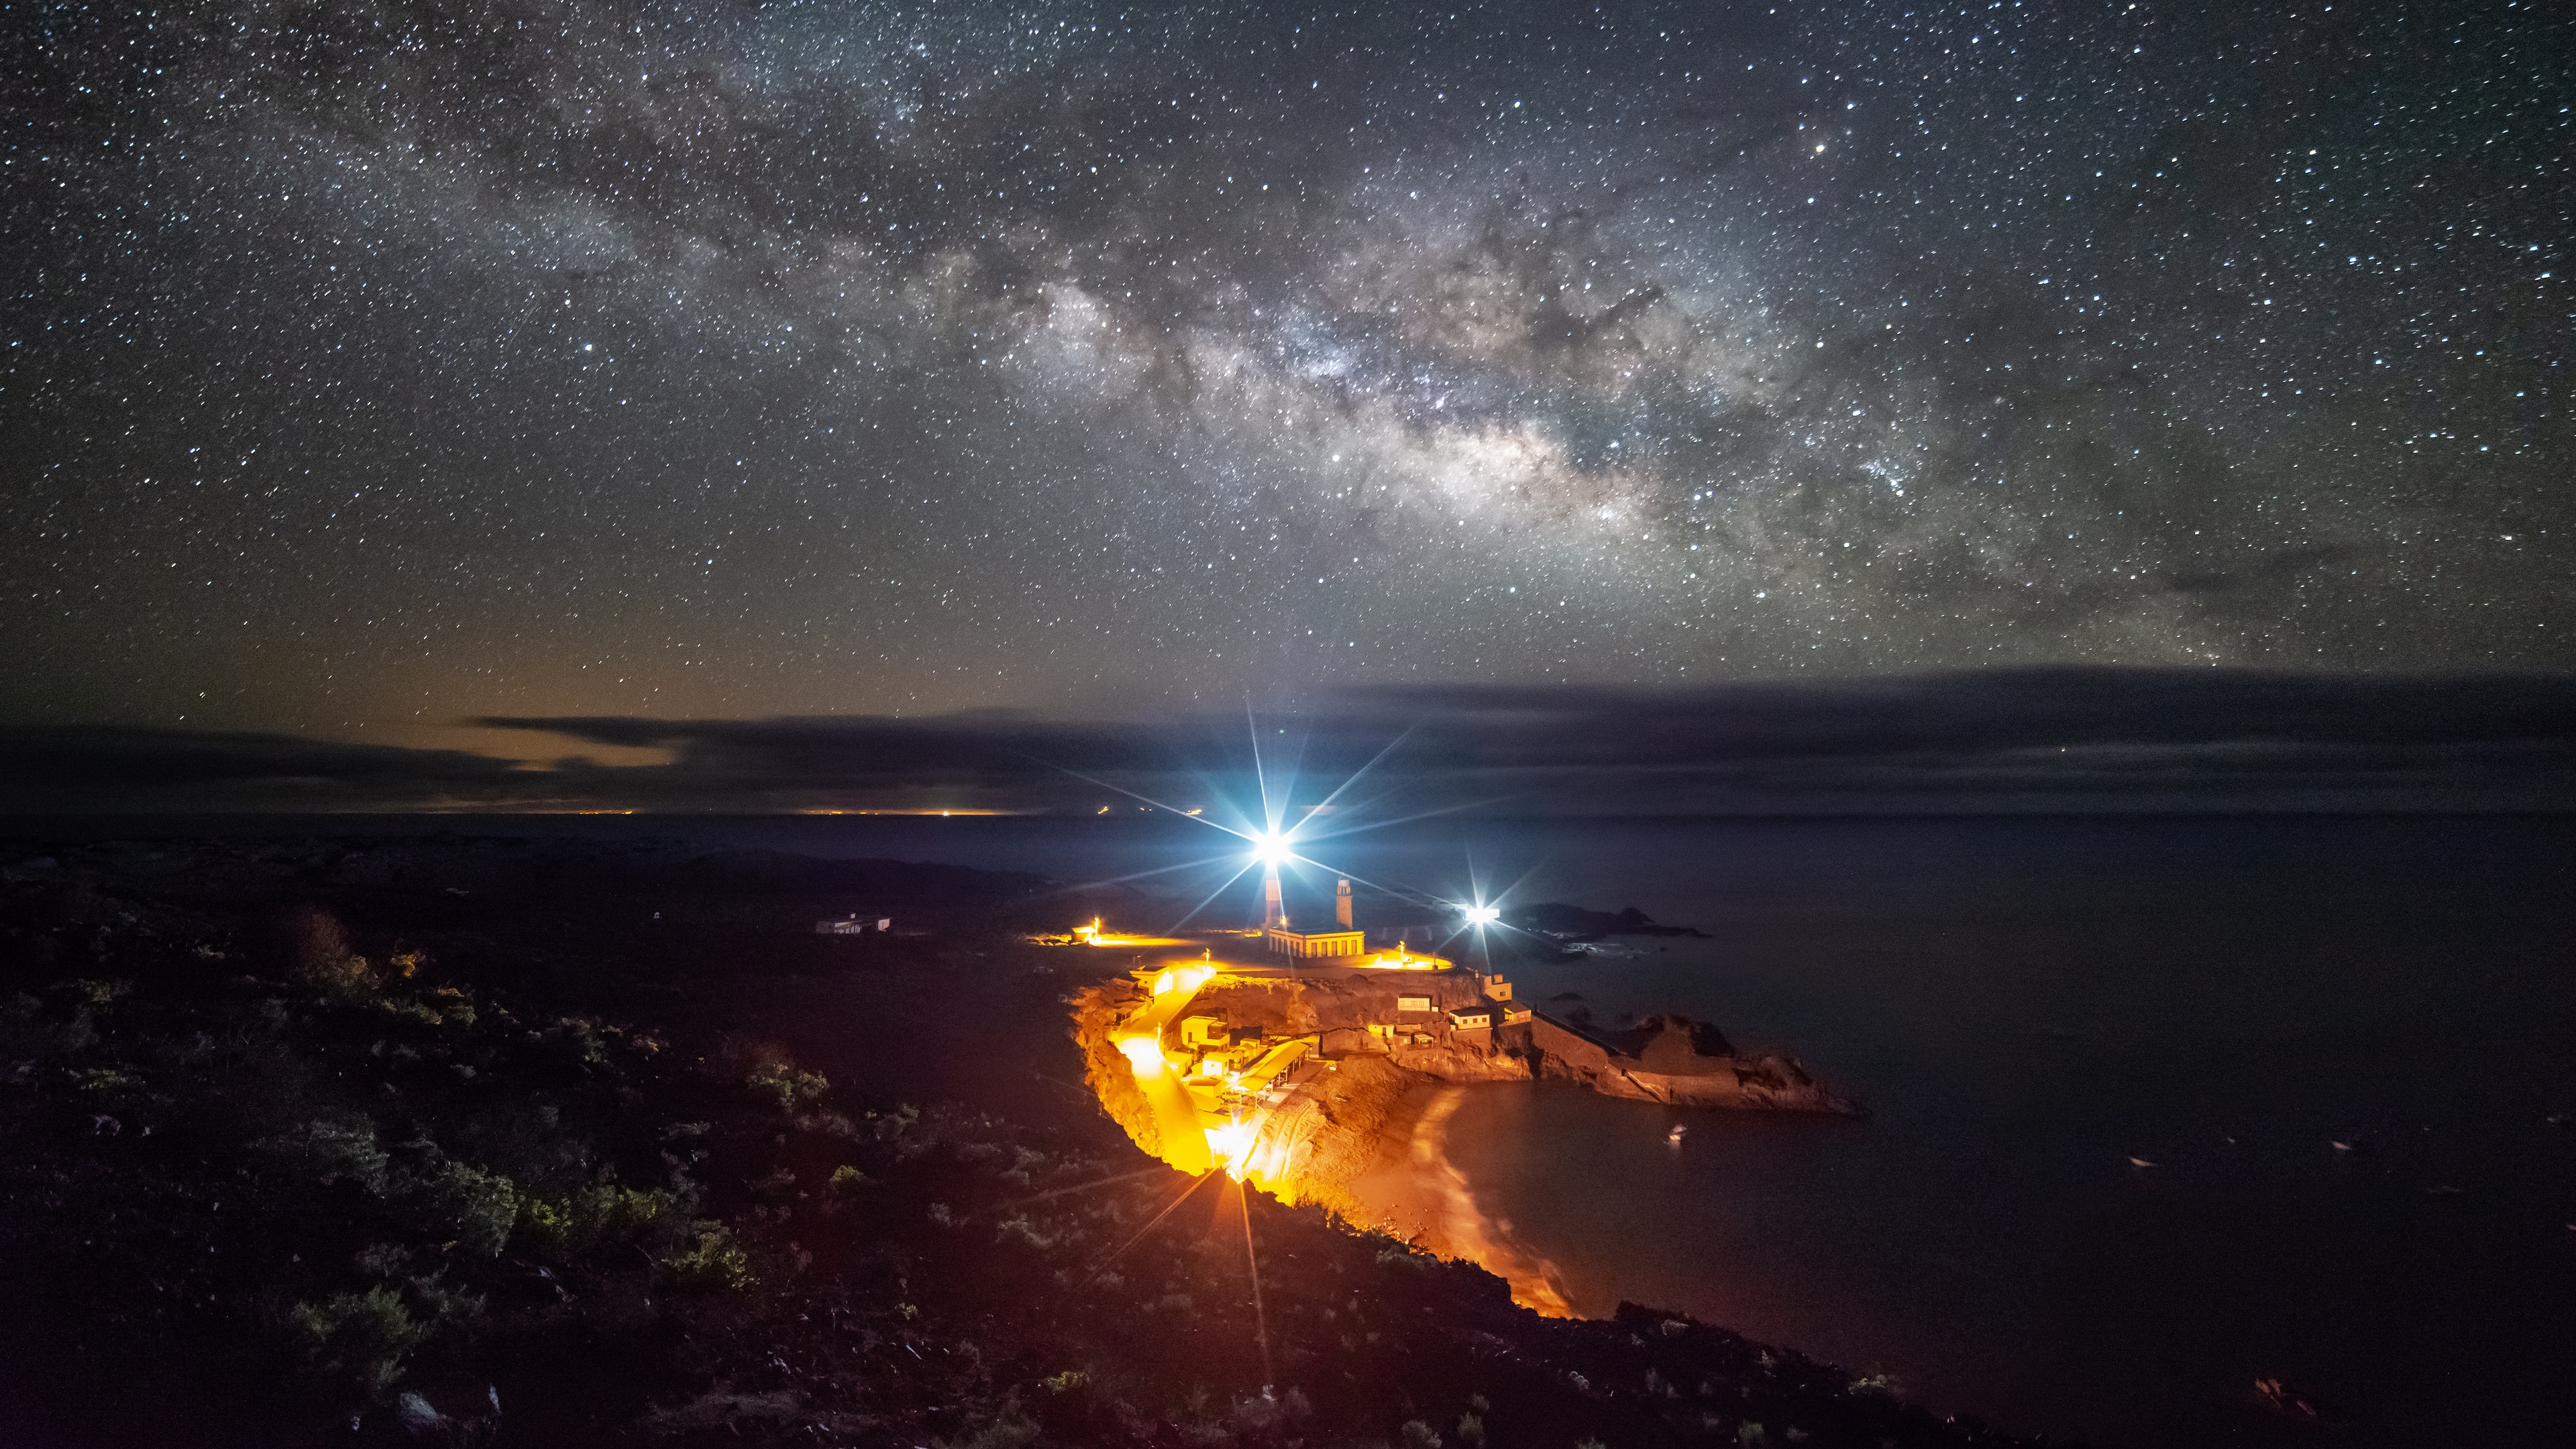 starry sky la palma spain night lighting 4k 1541117252 - starry sky, la palma, spain, night, lighting 4k - starry sky, Spain, la palma